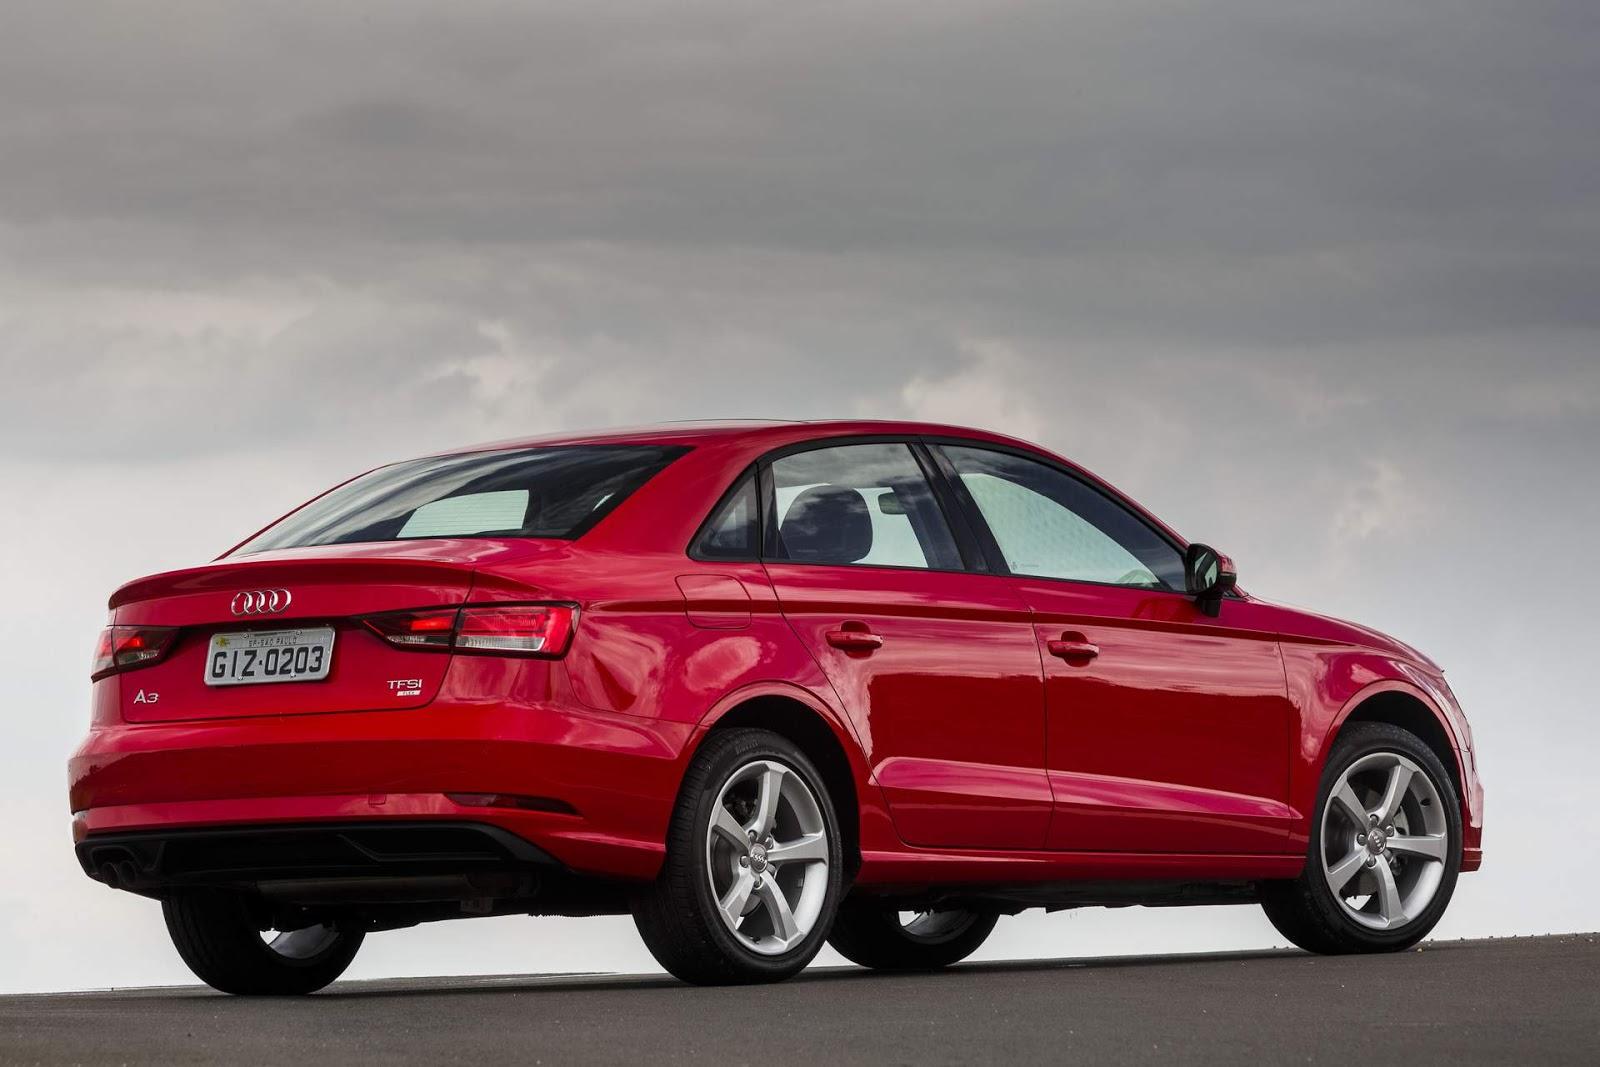 Dono De Audi Sedan Importado Relata Troca Por Nacional Car